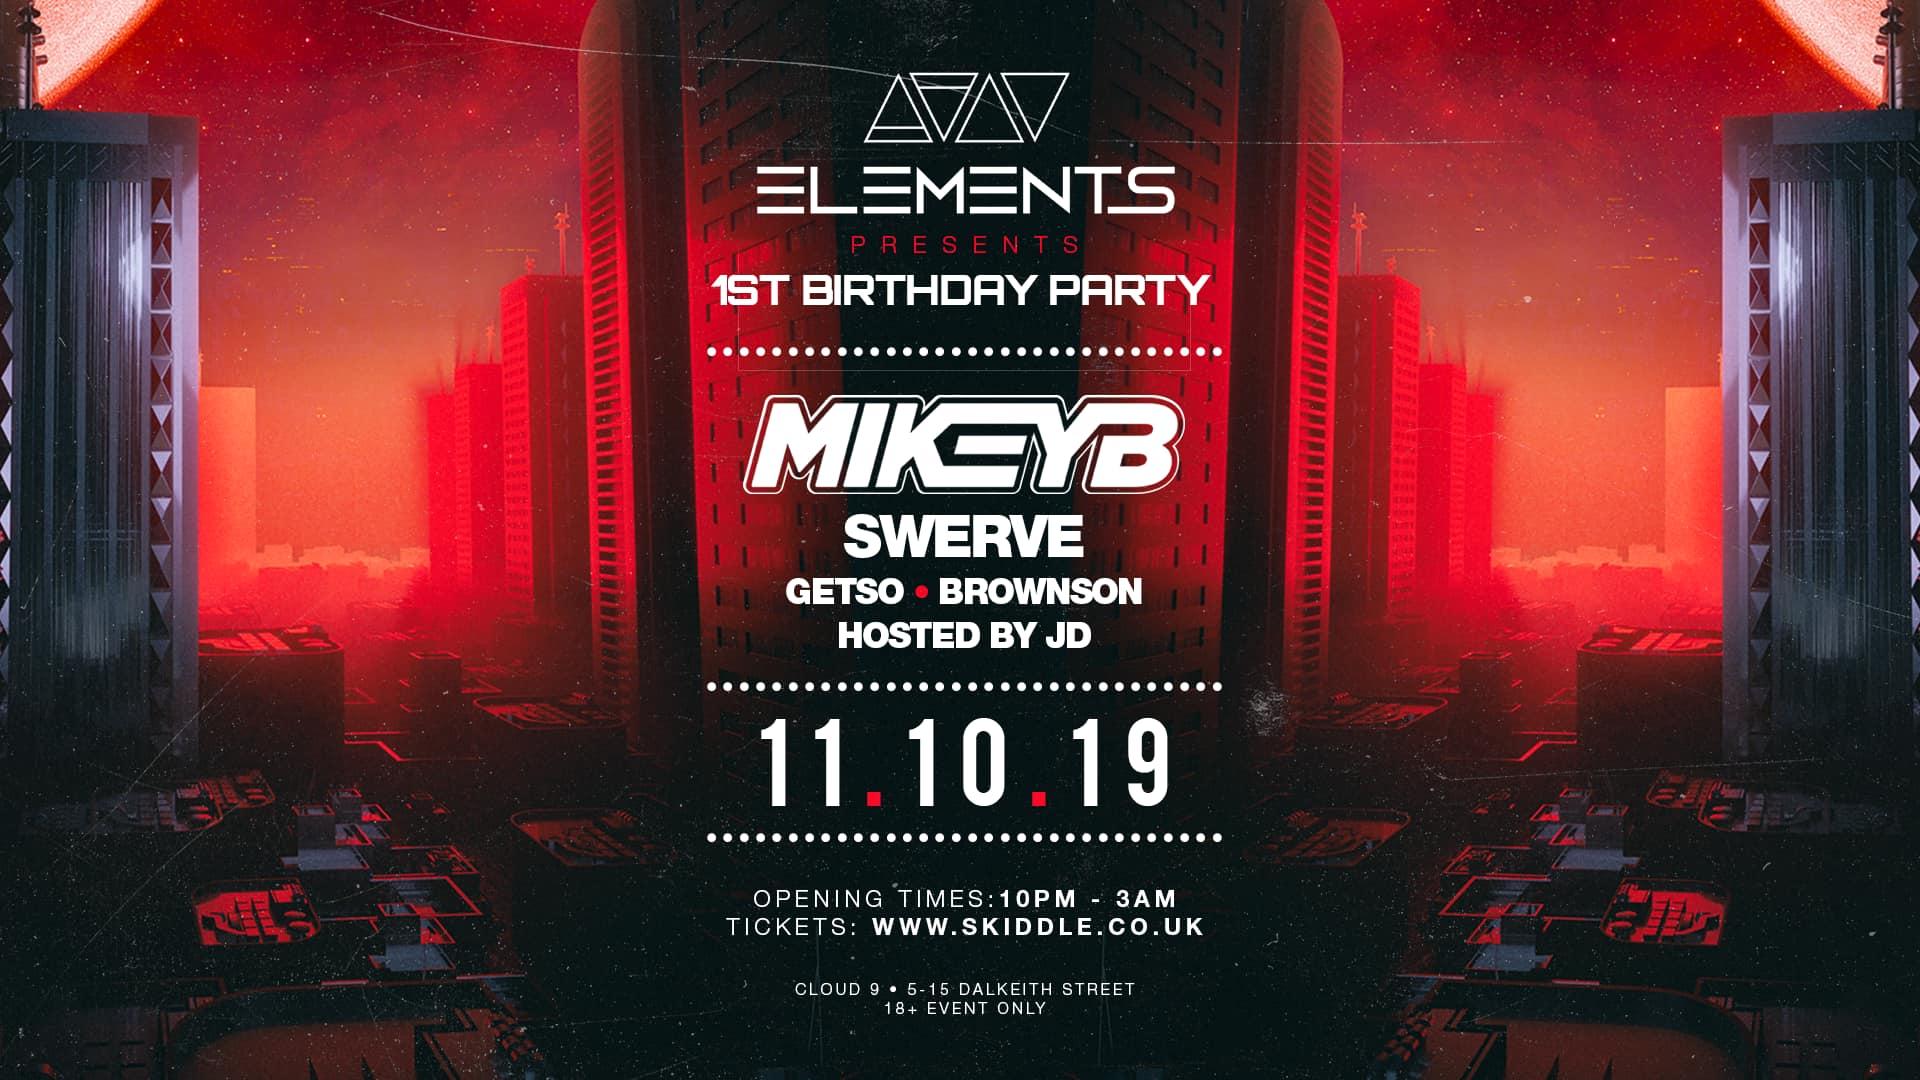 Elements Presents: Mikey B (1st Birthday Party)